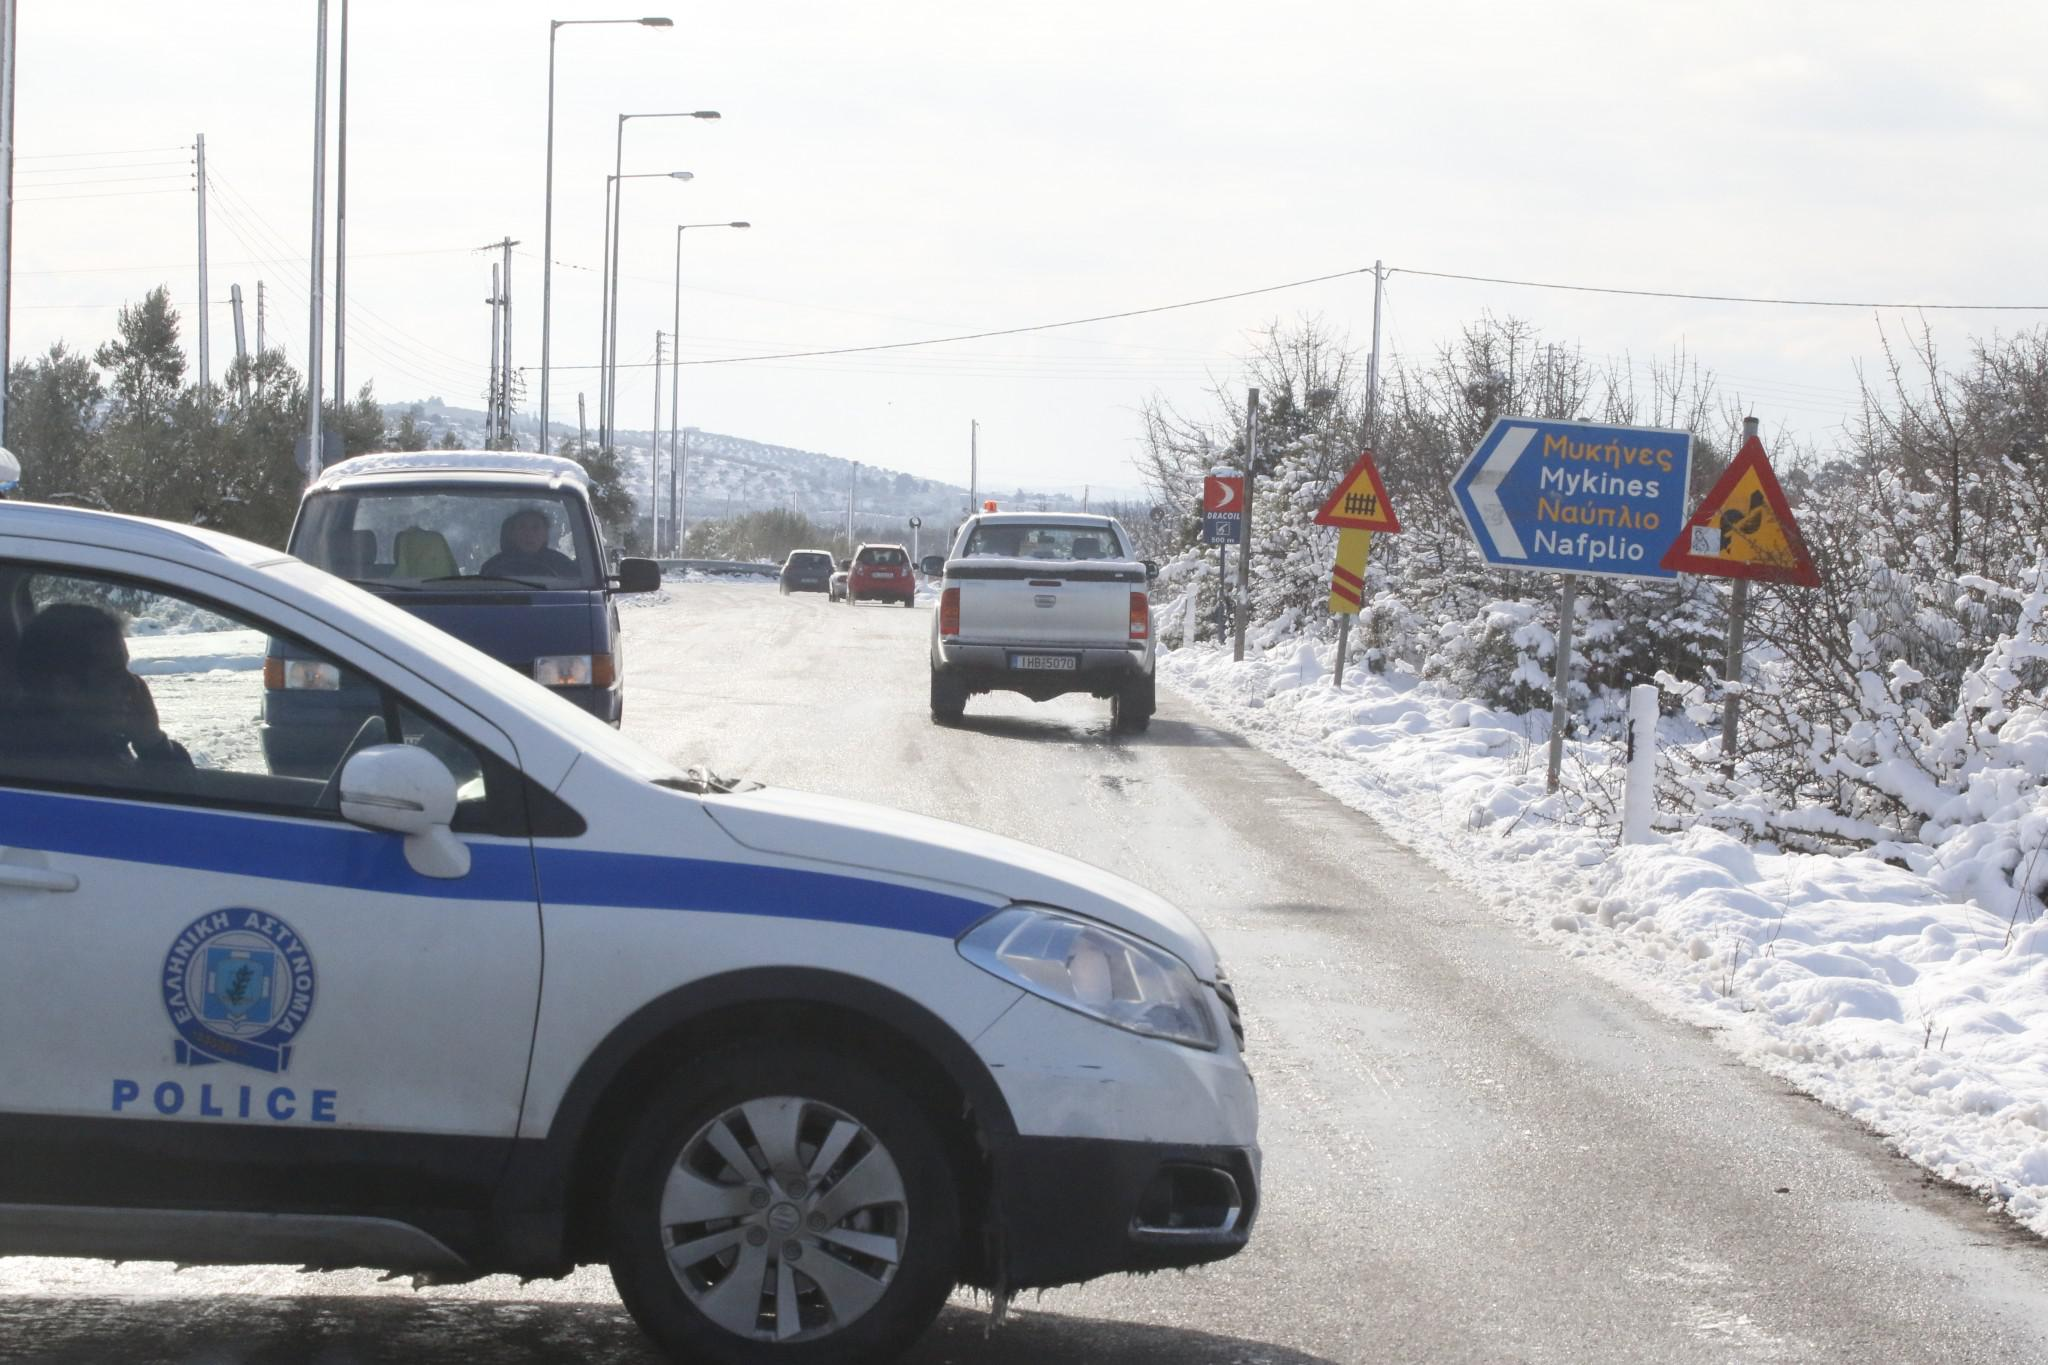 xionia-peloponisos-1 Τραγική κατάσταση στην Αλόννησο  – Πολλά προβλήματα σε όλη την Ελλάδα από τον χιονιά